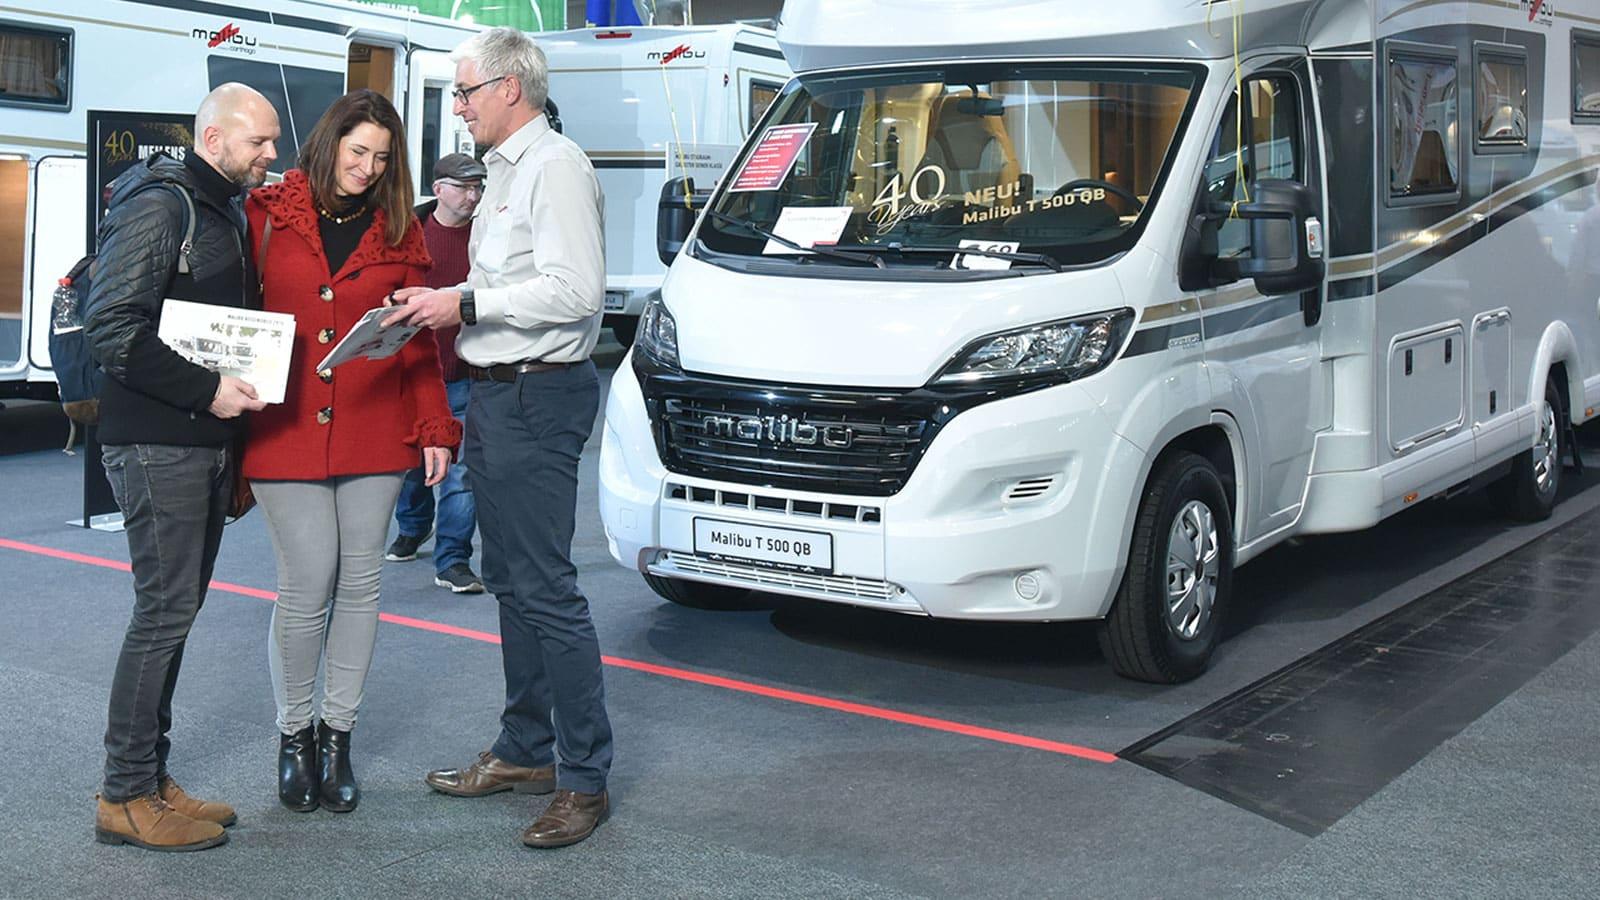 News - Camping, Cars & Caravans